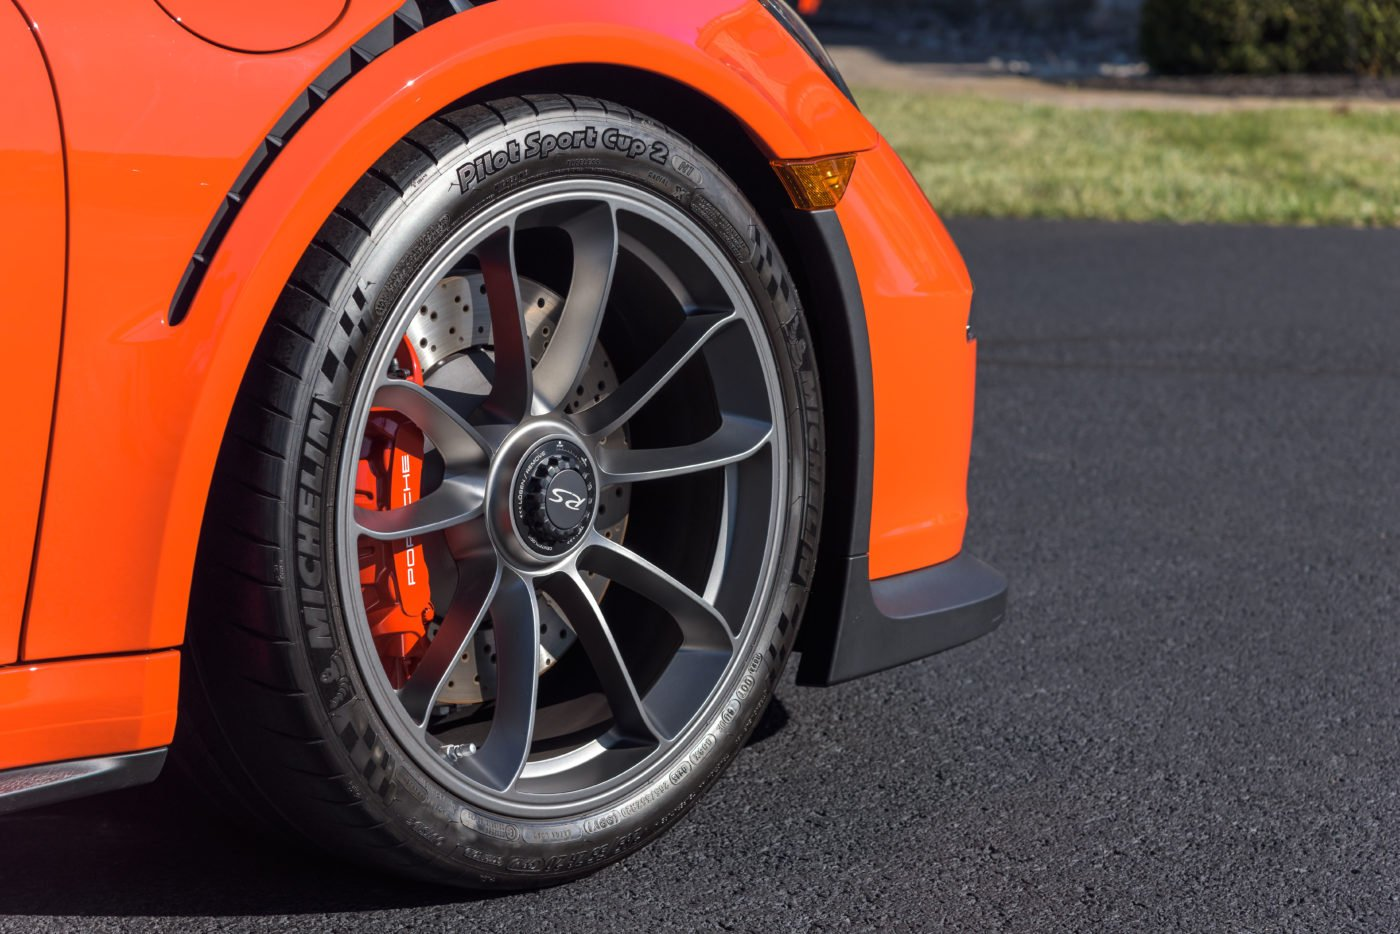 Porsche 911 GT3 RS specs demand the best brakes in the world